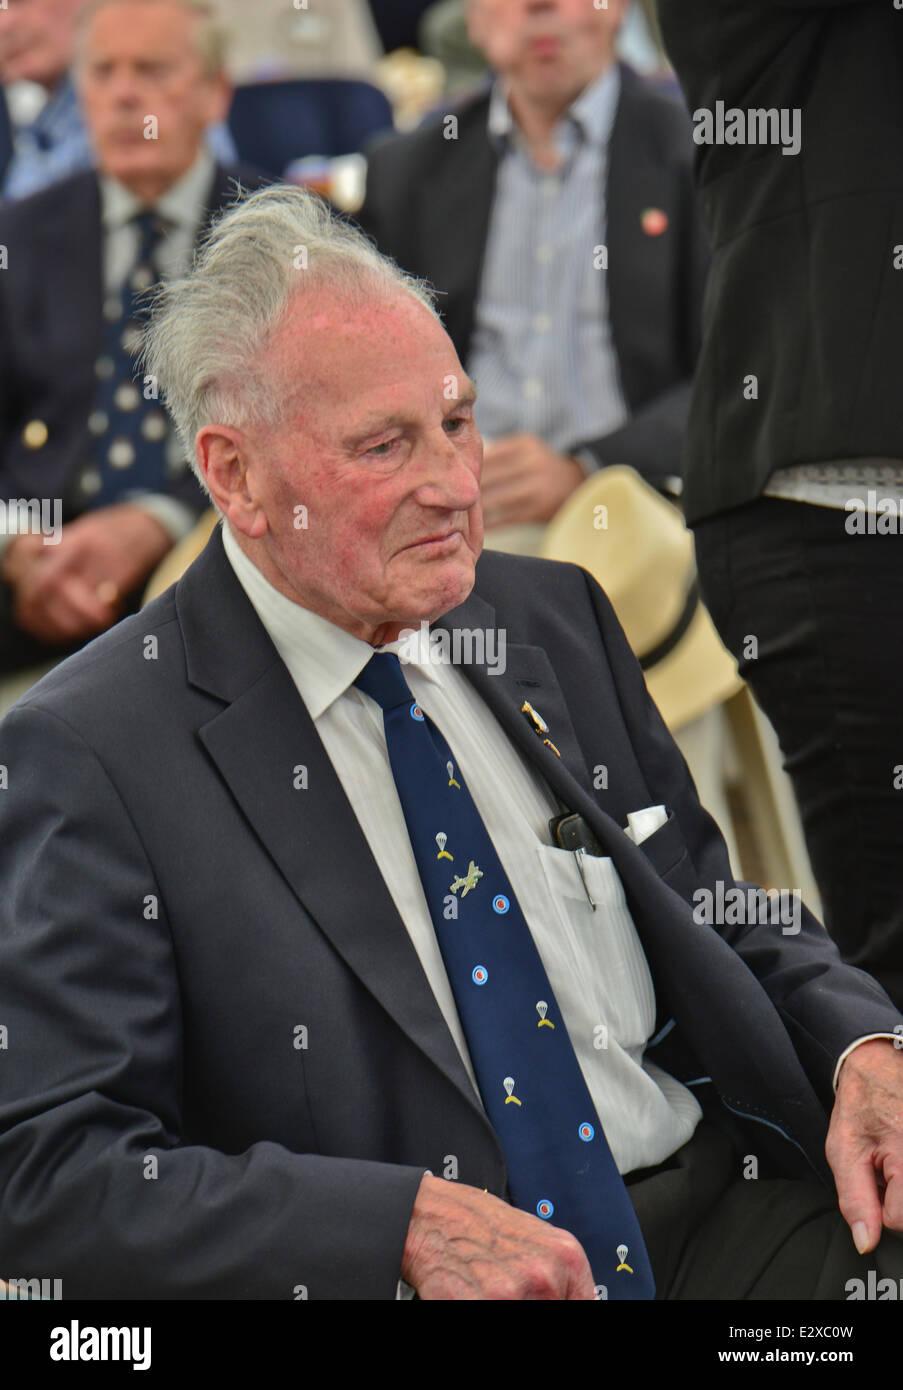 Staverton, Cheltenham, Gloucestershire, UK . 21st June, 2014. Picture Shows:RAF Veterans gather at Project Propeller, - Stock Image